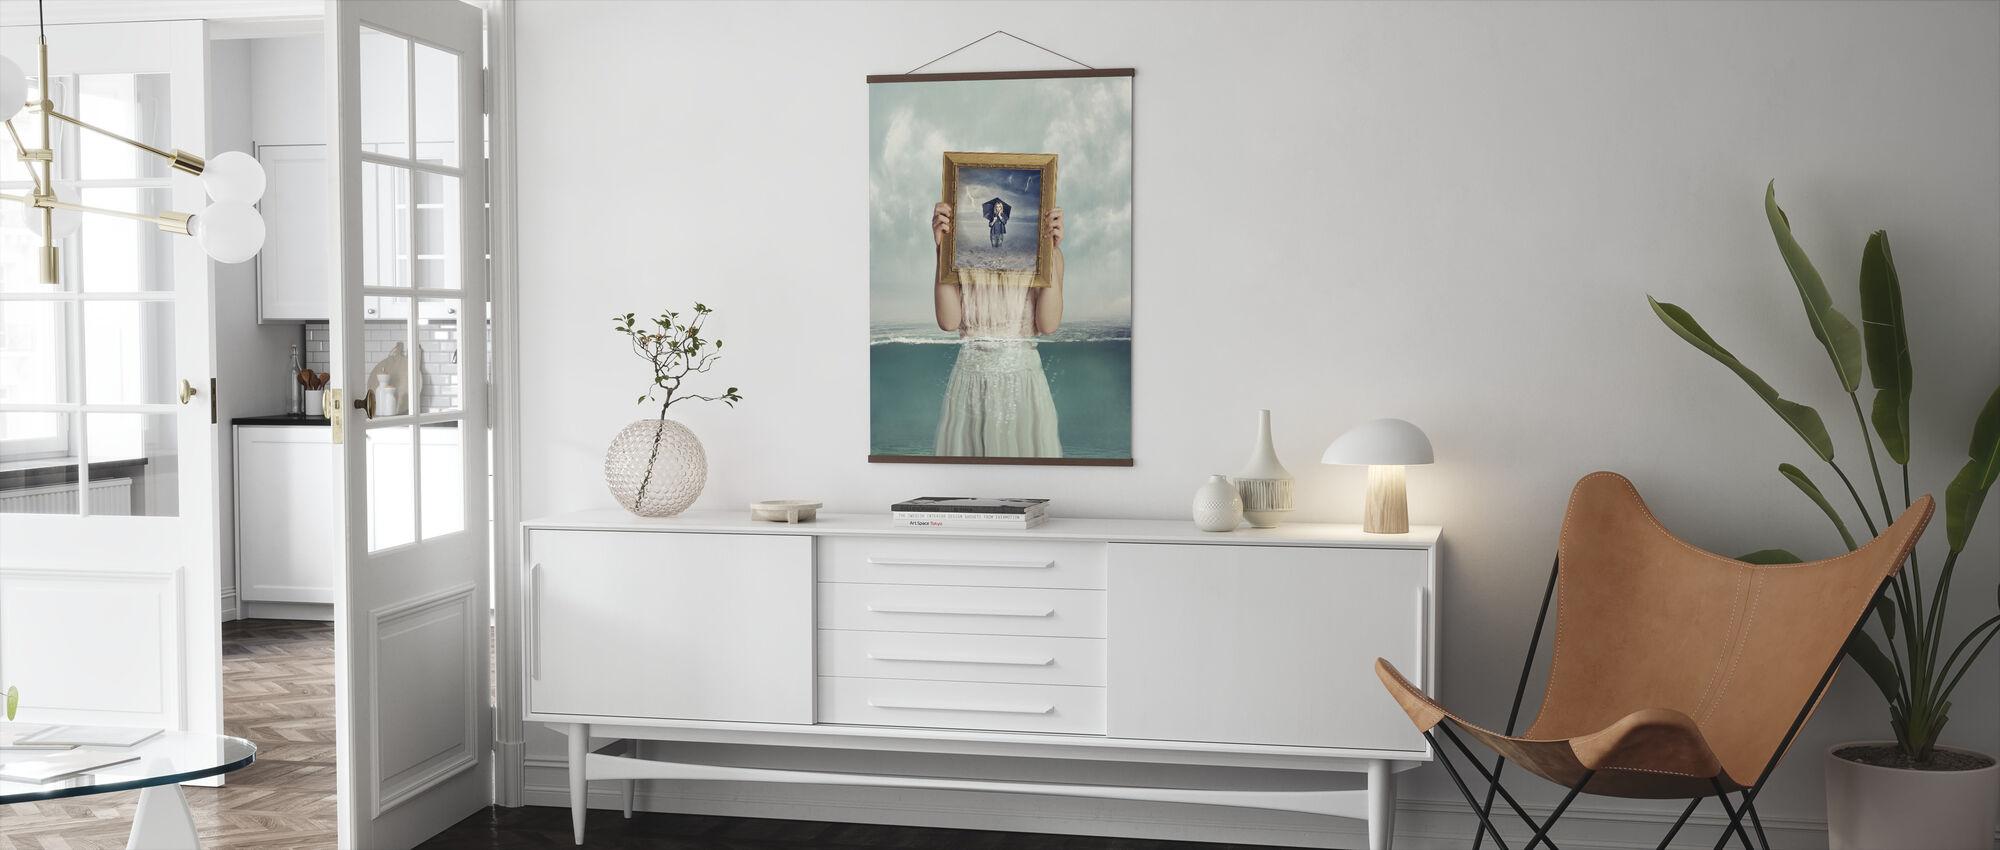 Deeper - Poster - Living Room